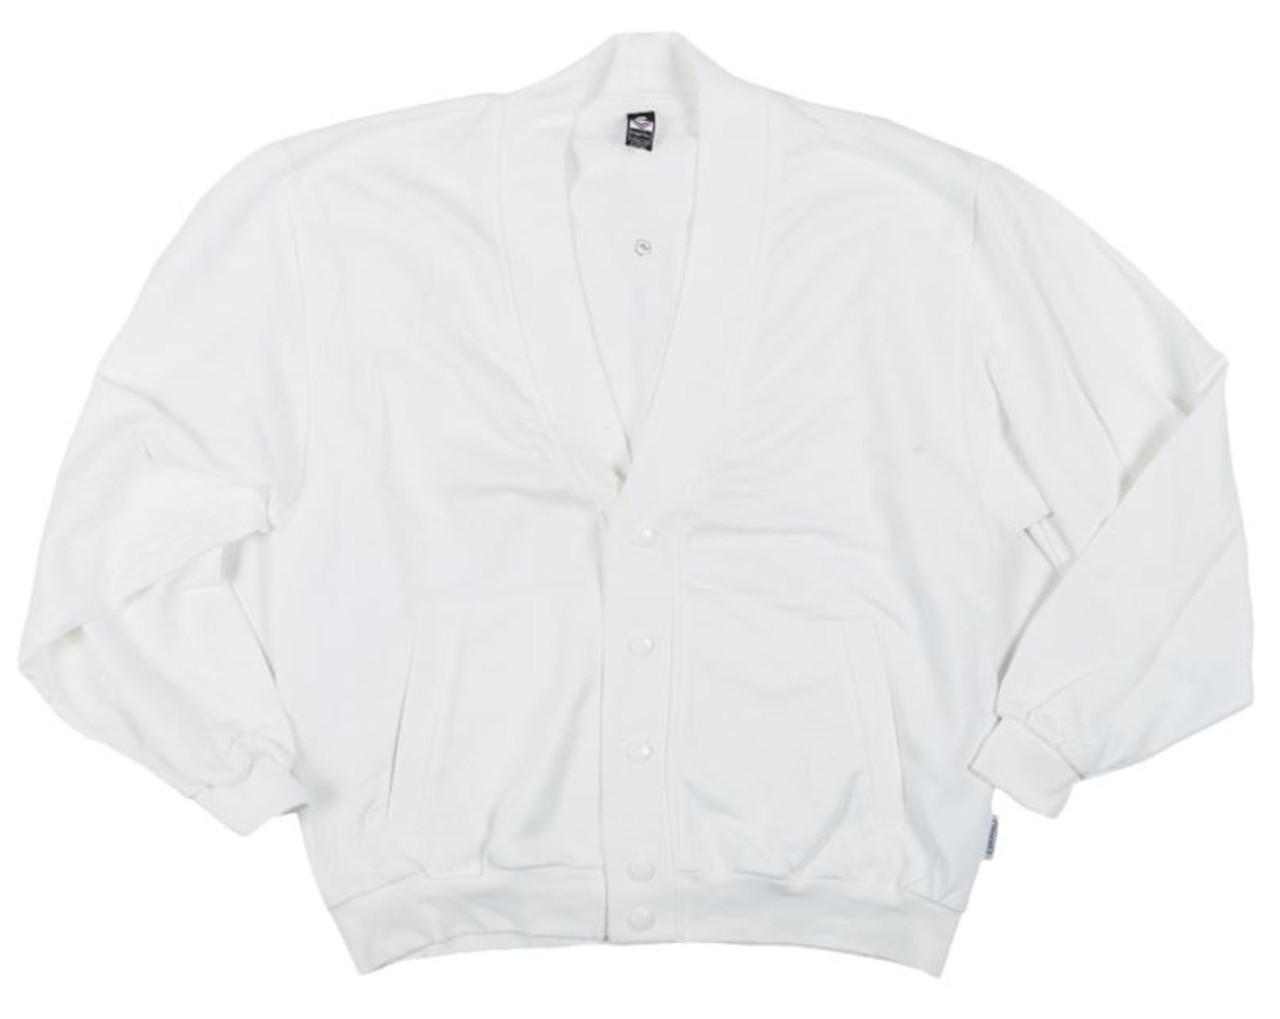 German White Trigema Sports Jacket - Used from Hessen Surplus